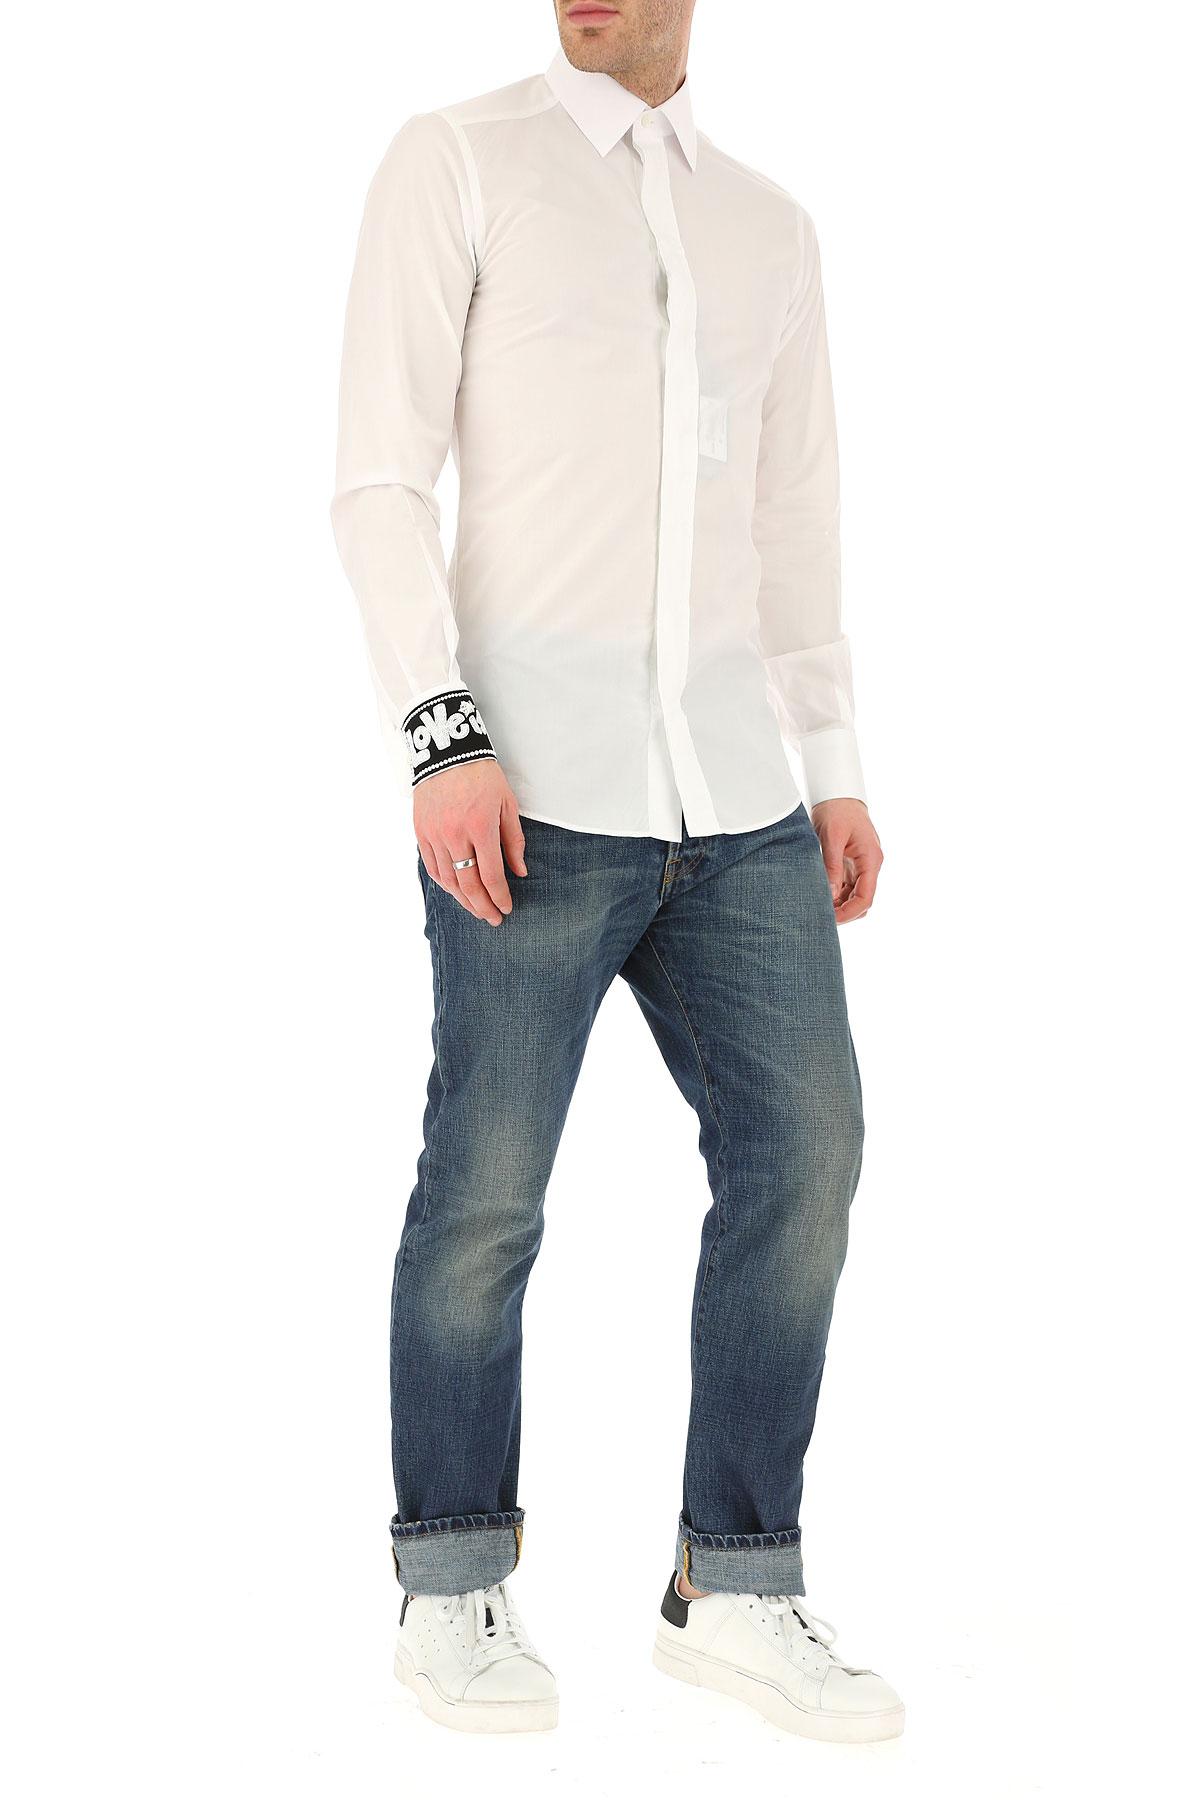 Dolce amp; Para Gabbana 2019 Blanco verano Hombres Primavera Ropa nbsp; vwv6xyrf7q